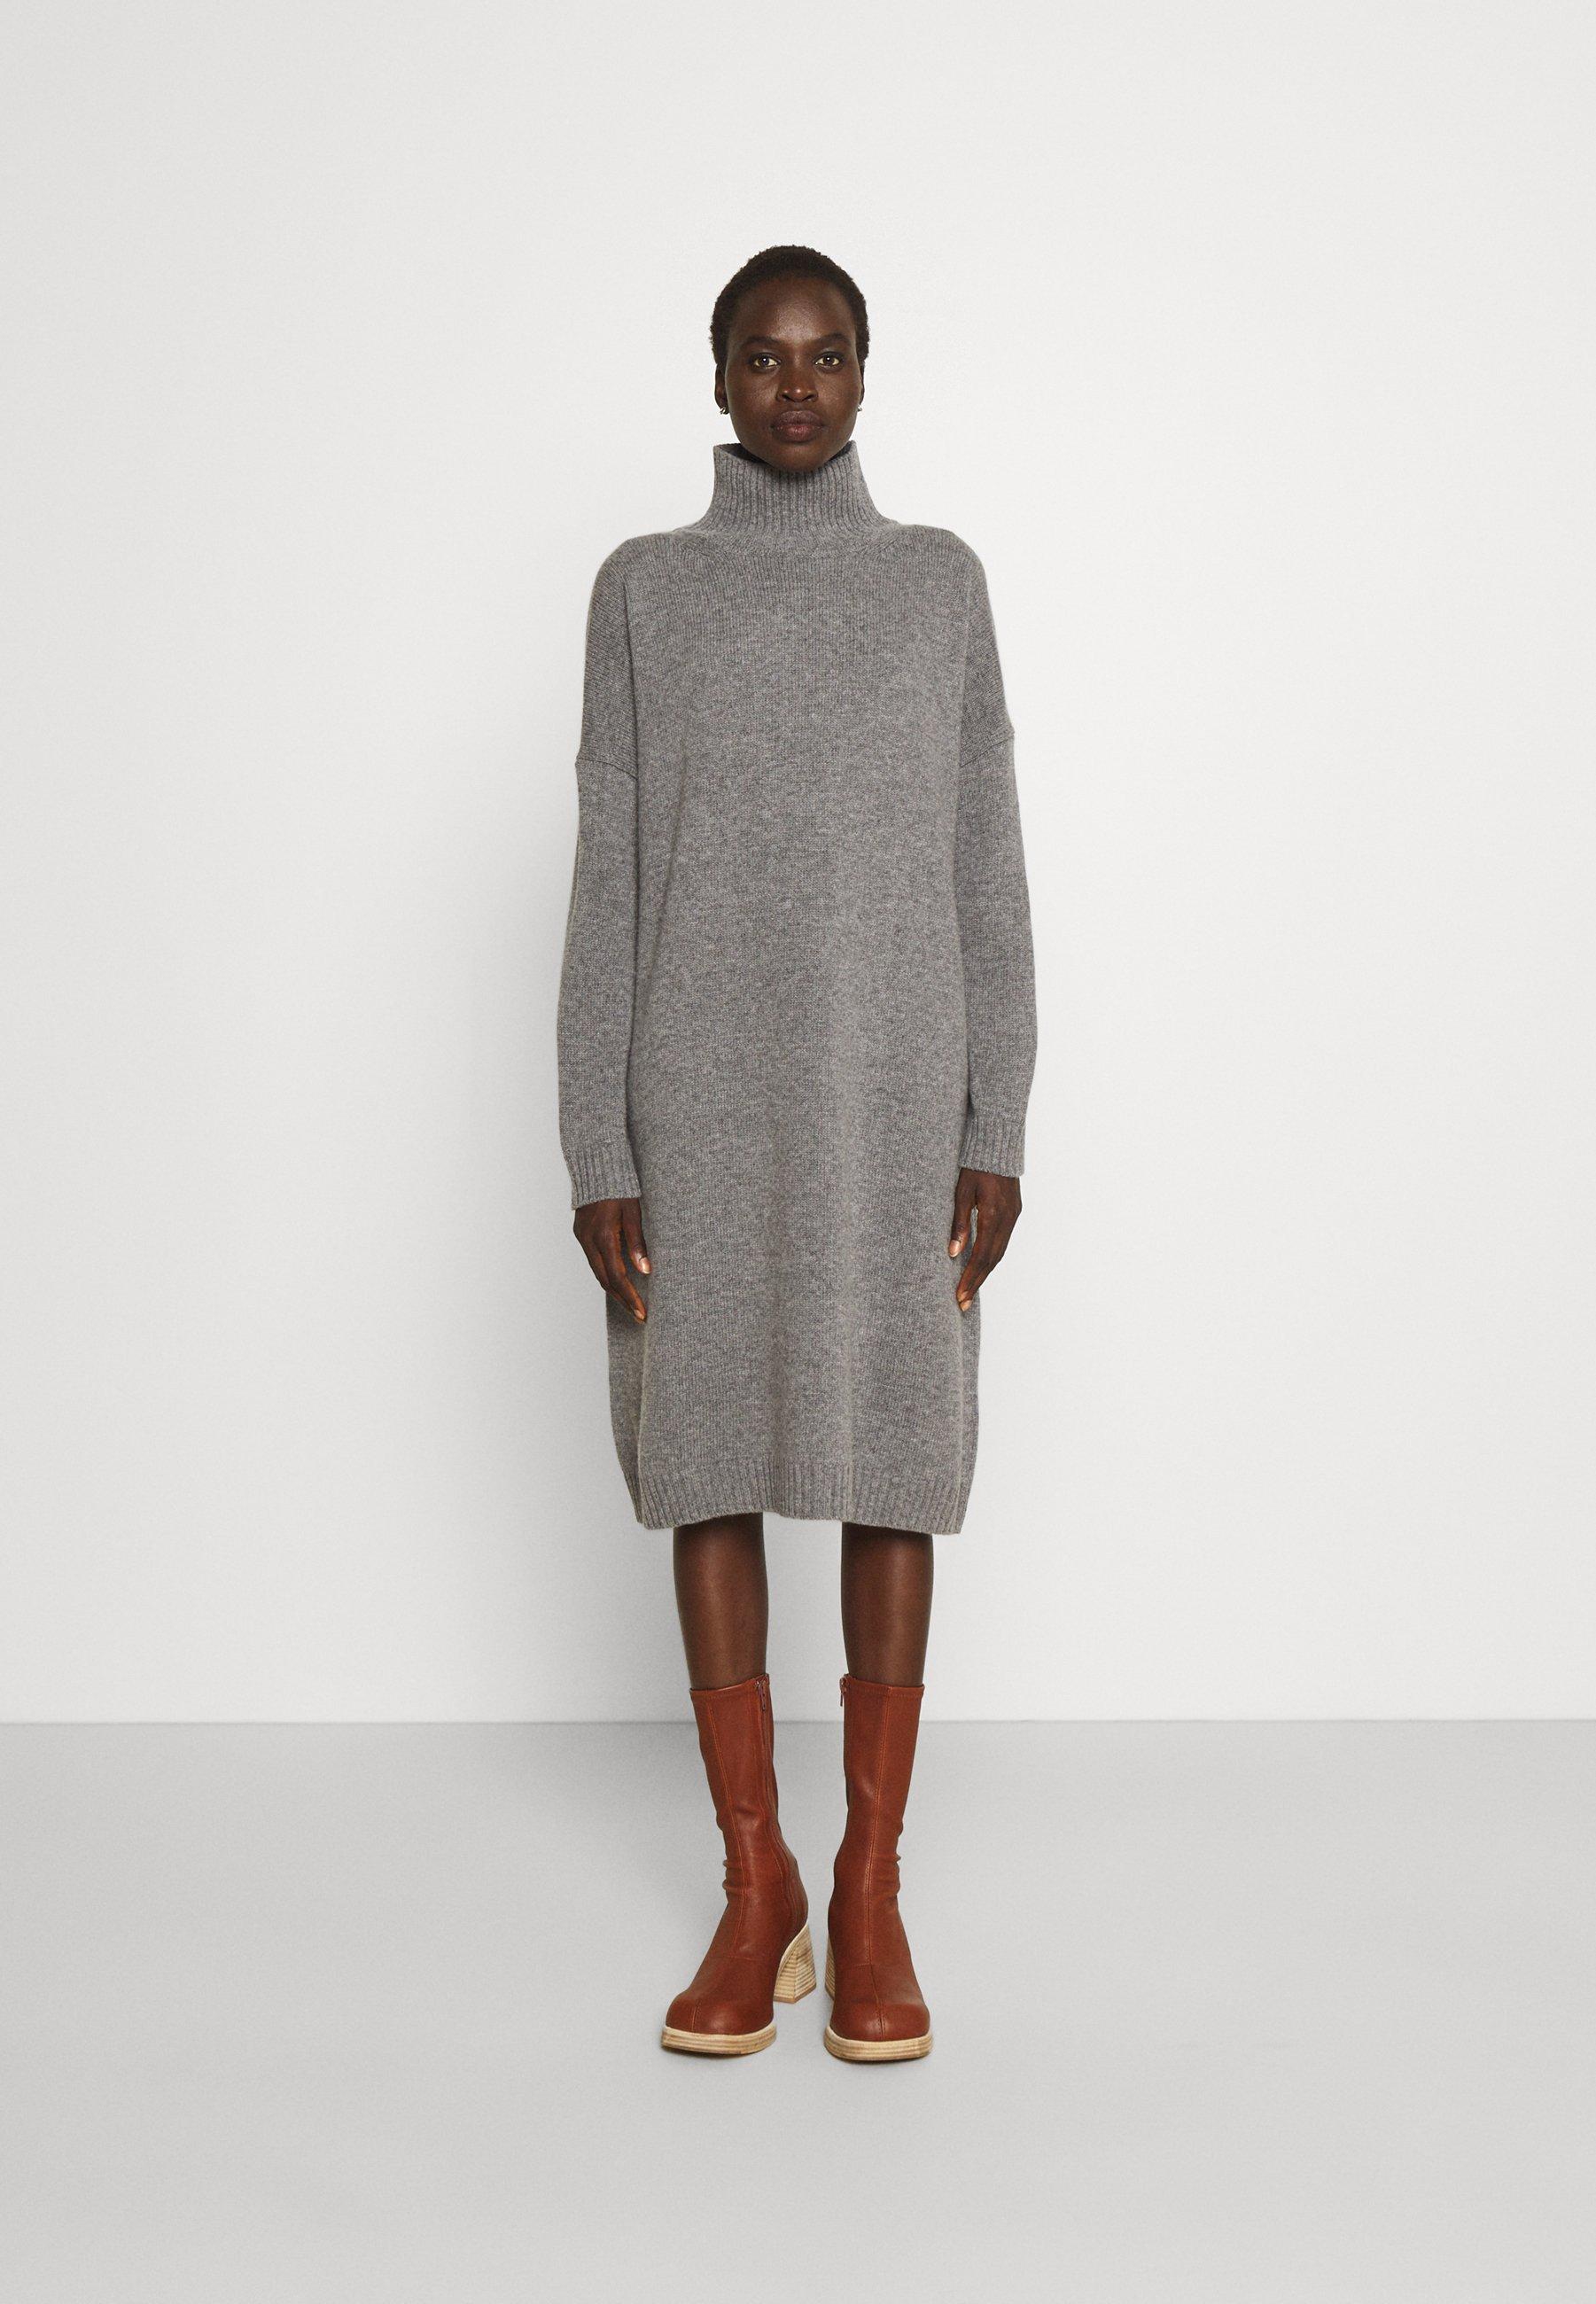 Femme FASCINO - Robe pull